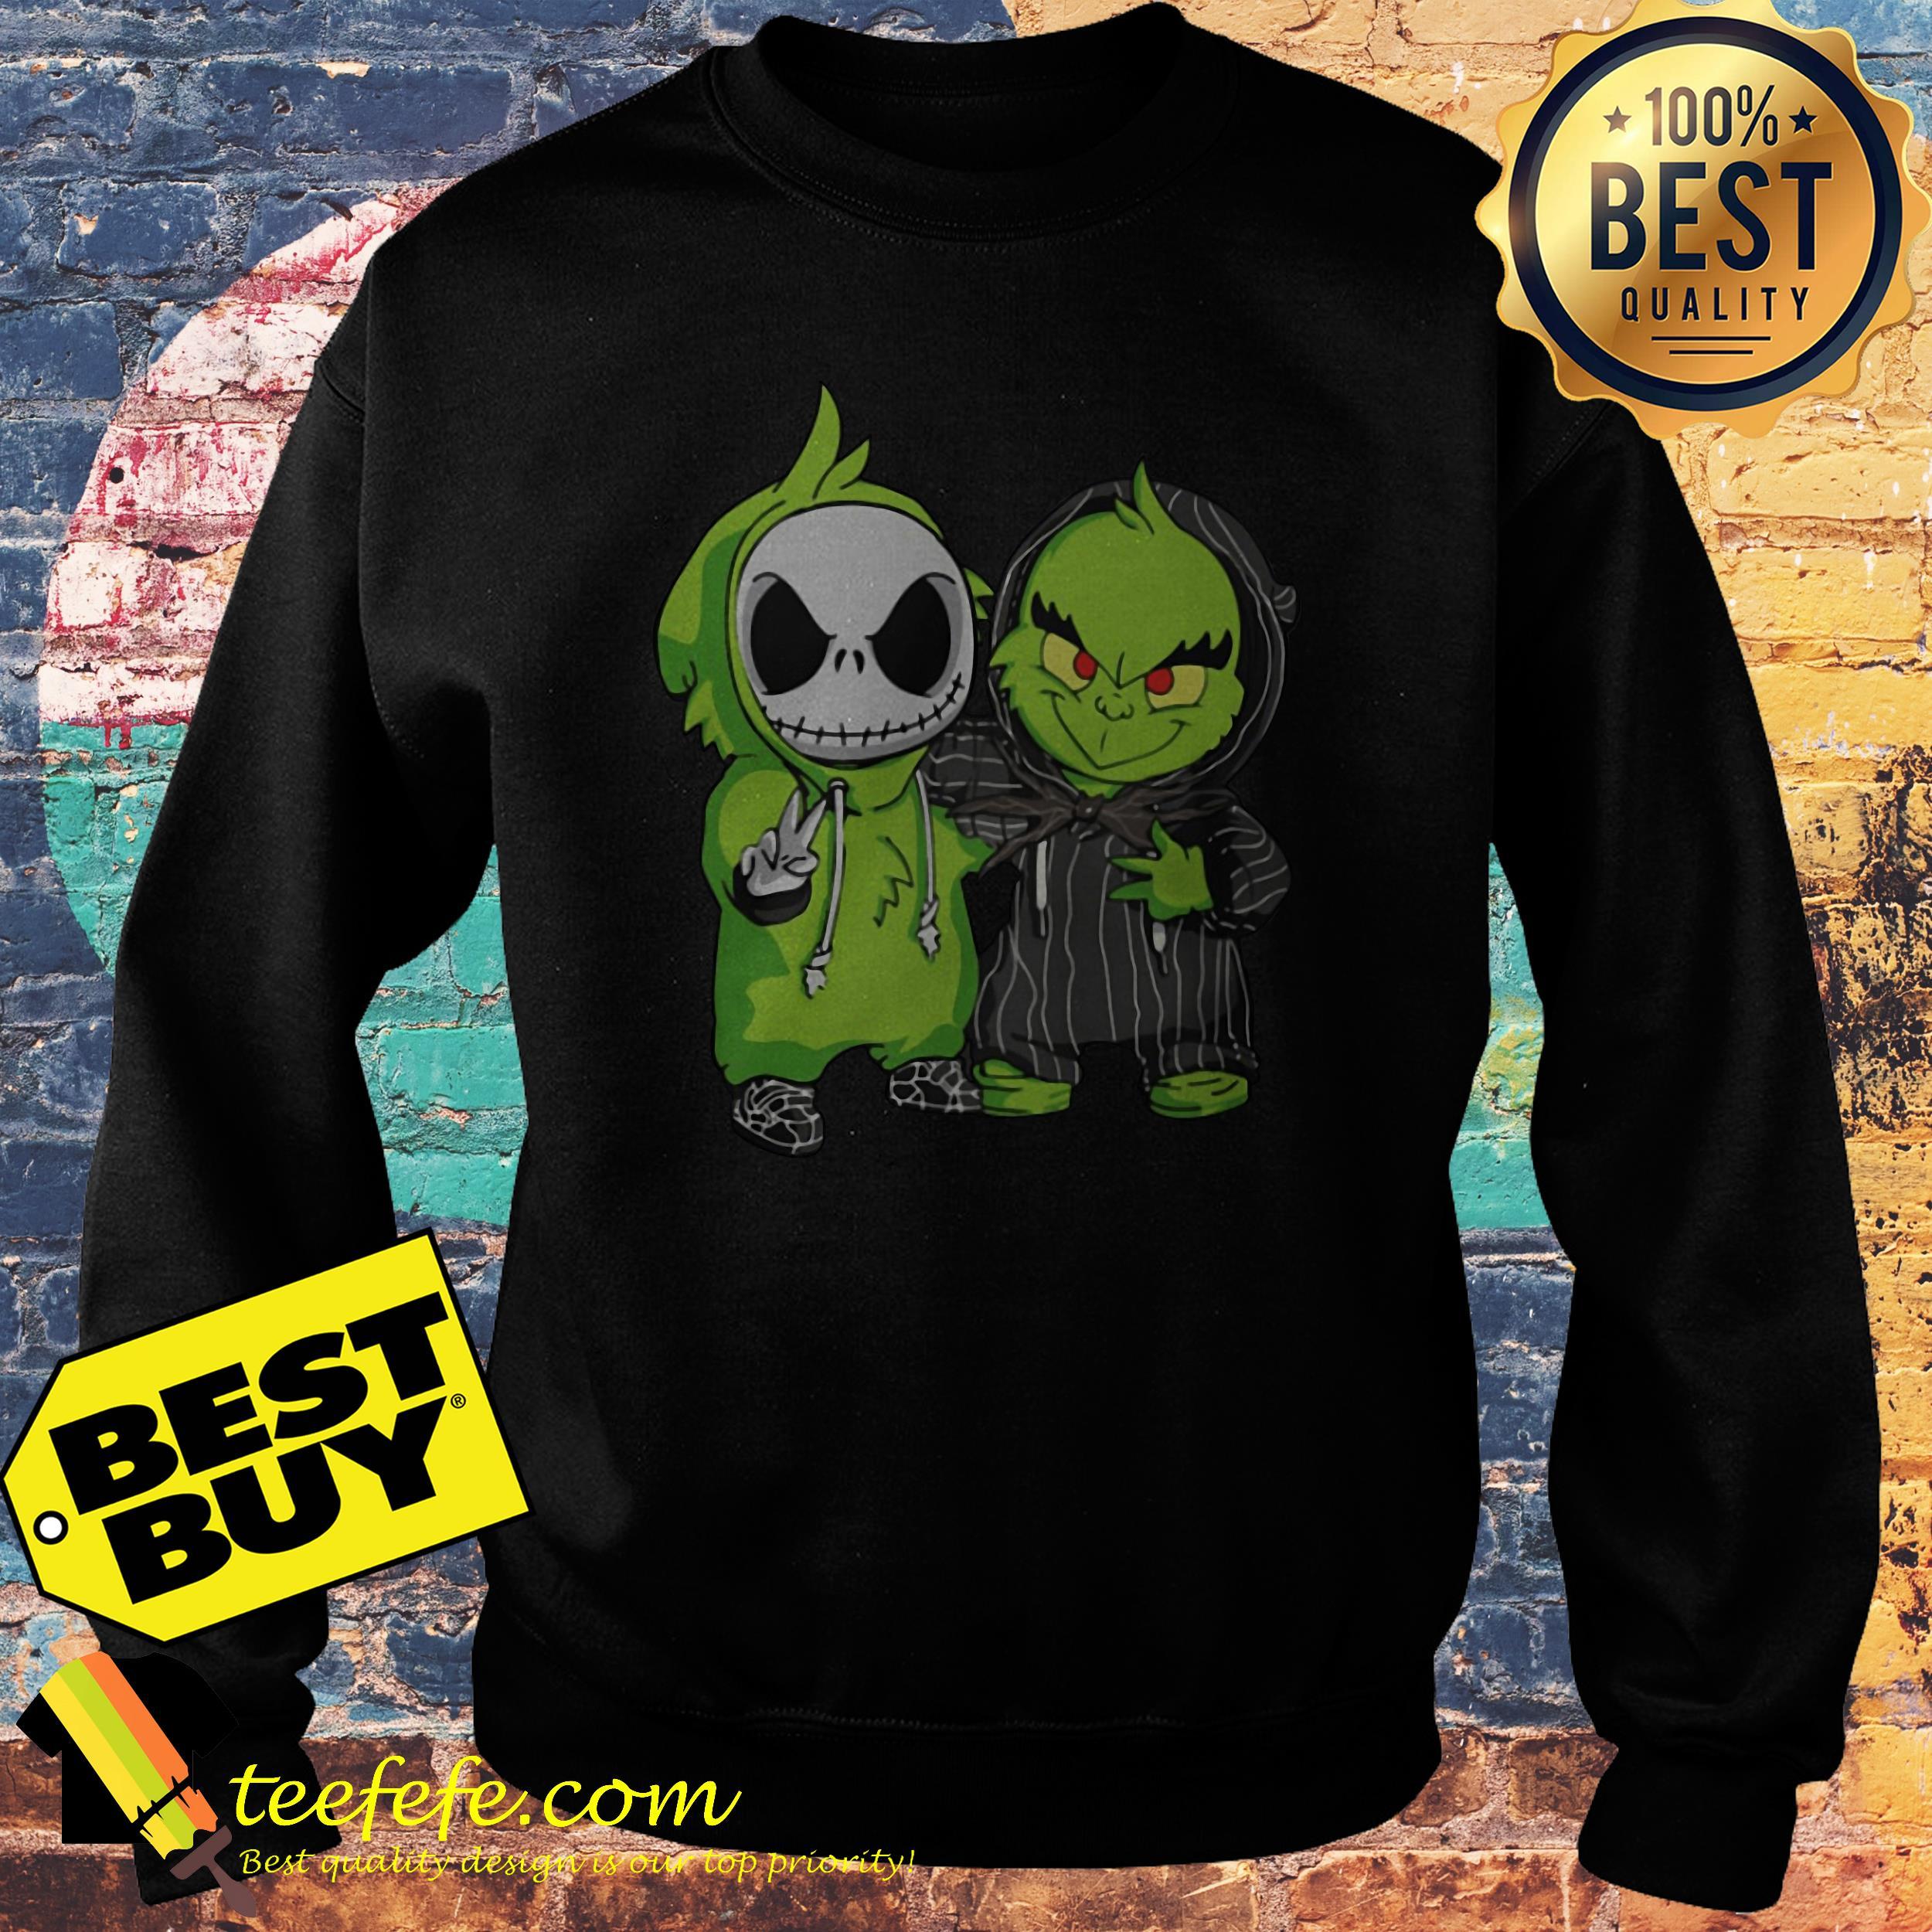 Jack Skellington and Grinch sweatshirt